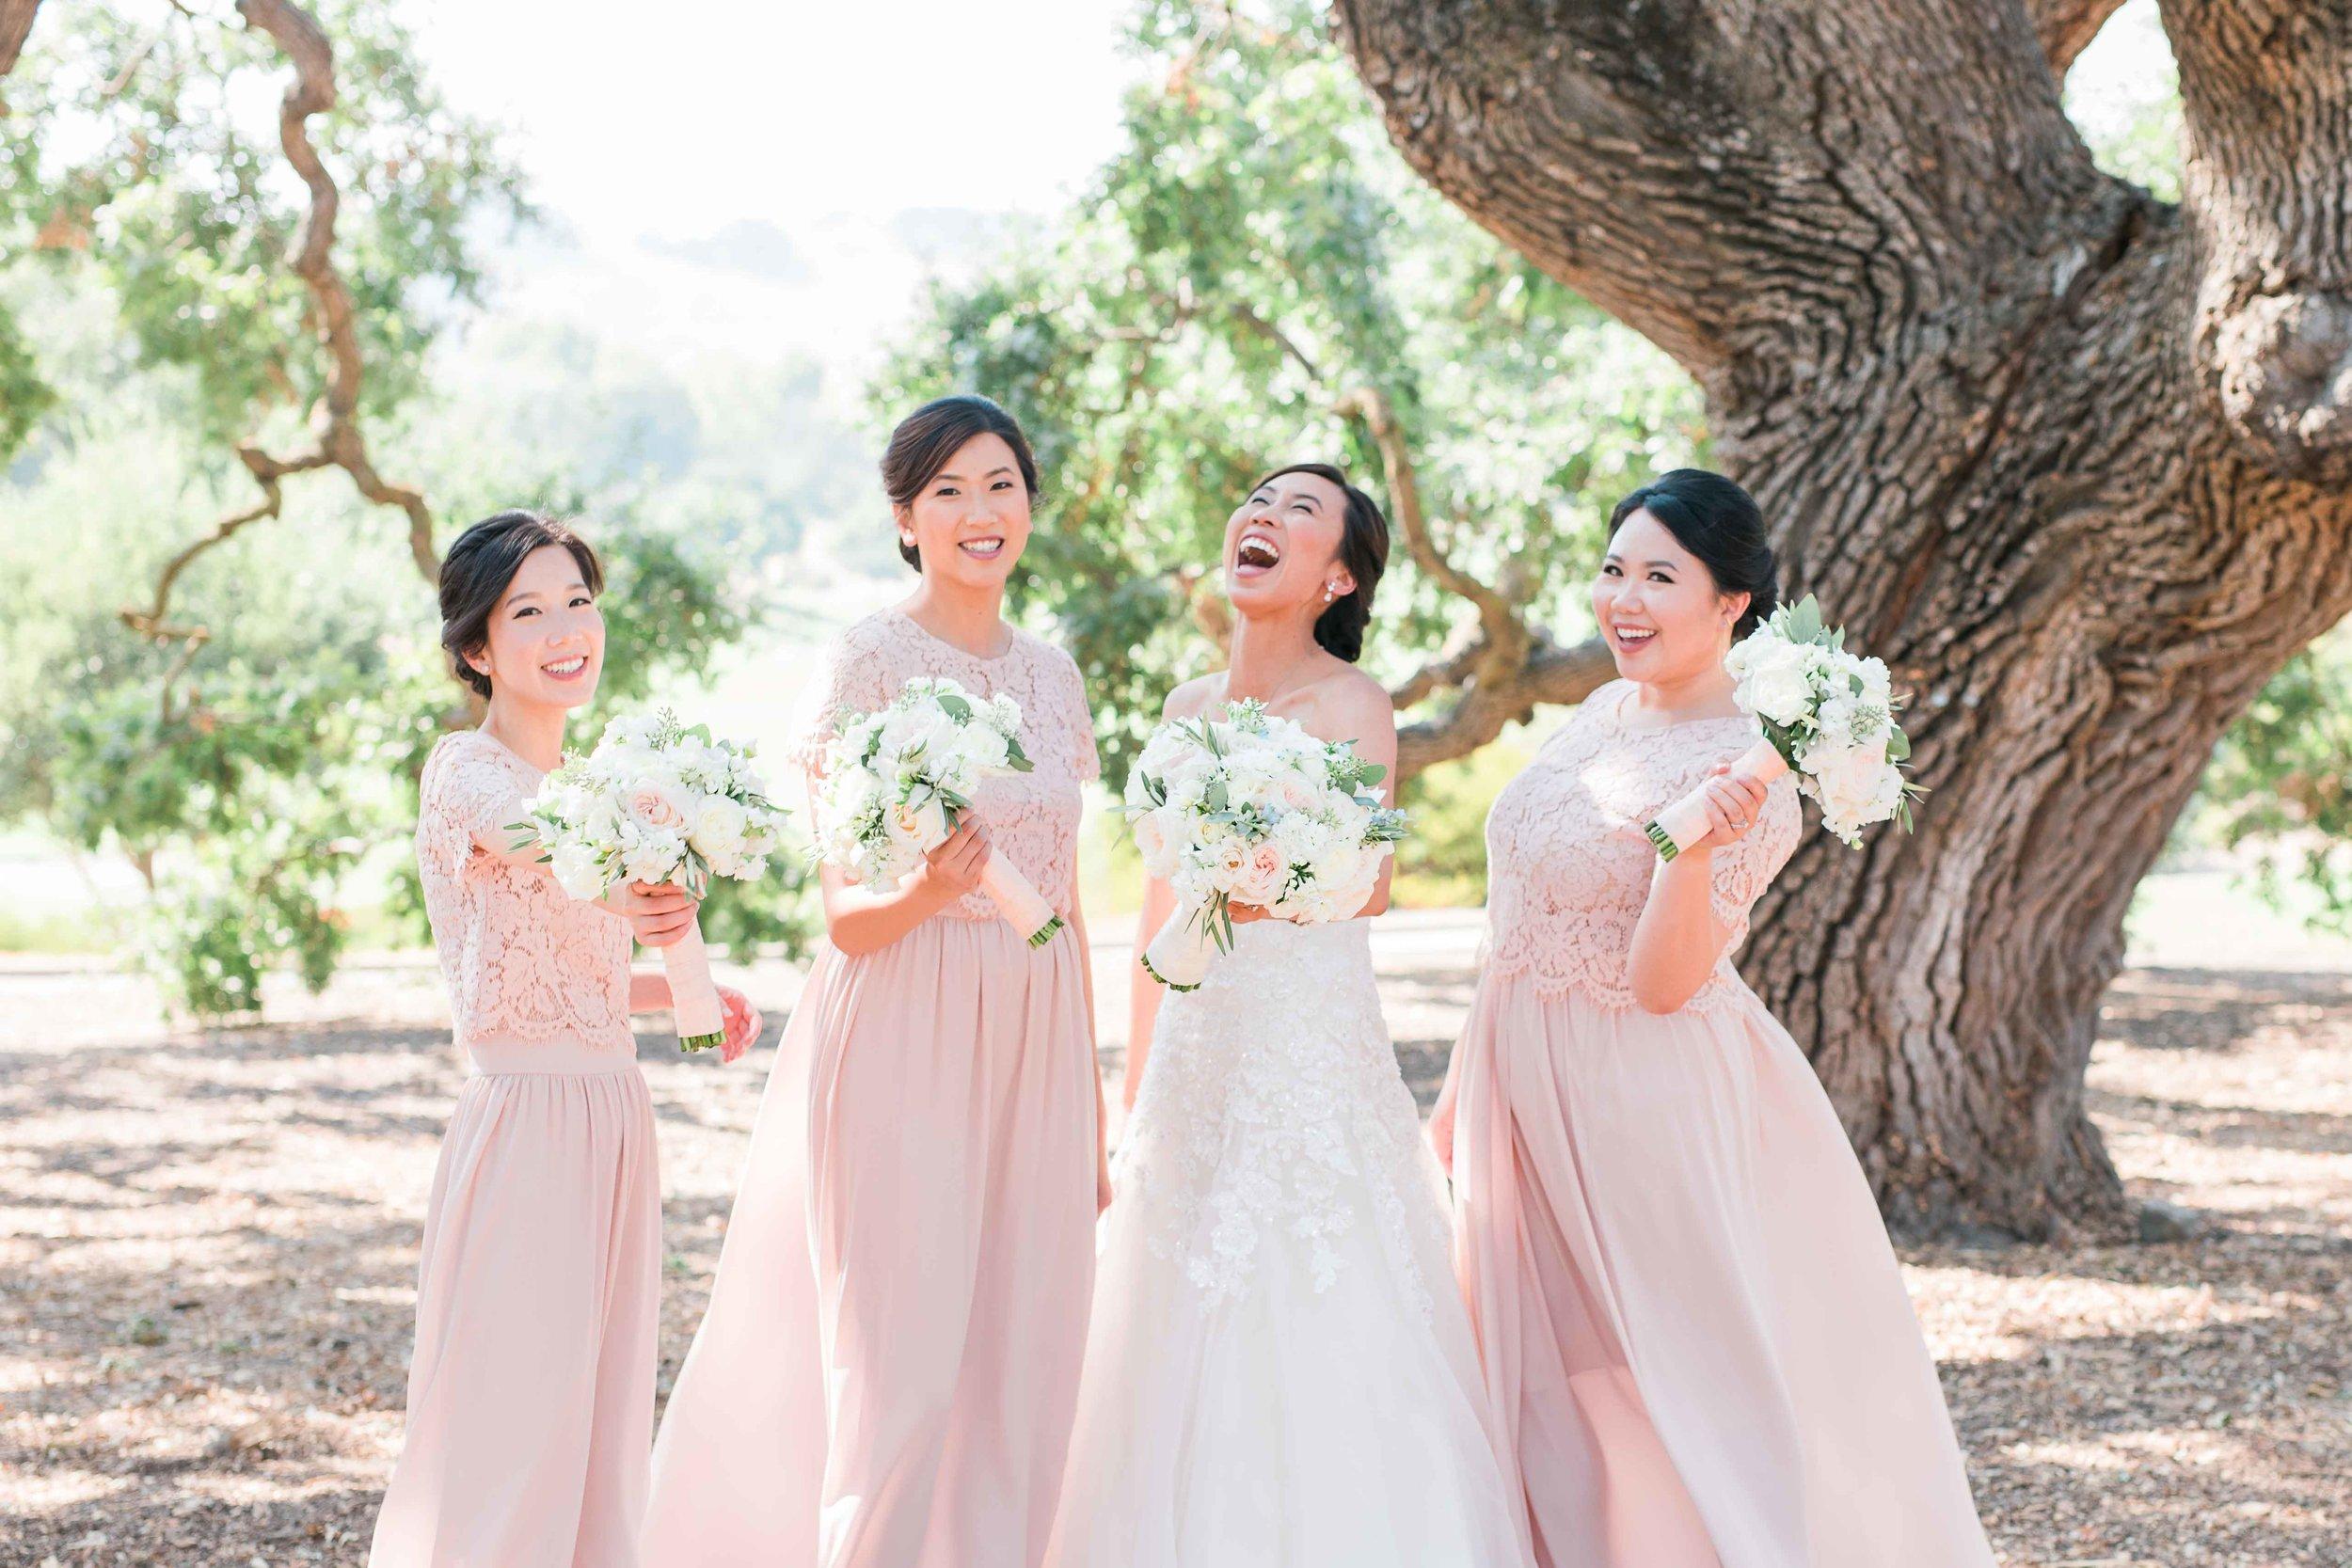 Ruby Hill Wedding Photos by JBJ Pictures - San Francisco Wedding Photographer - Pleasanton Wedding Venue (25).jpg